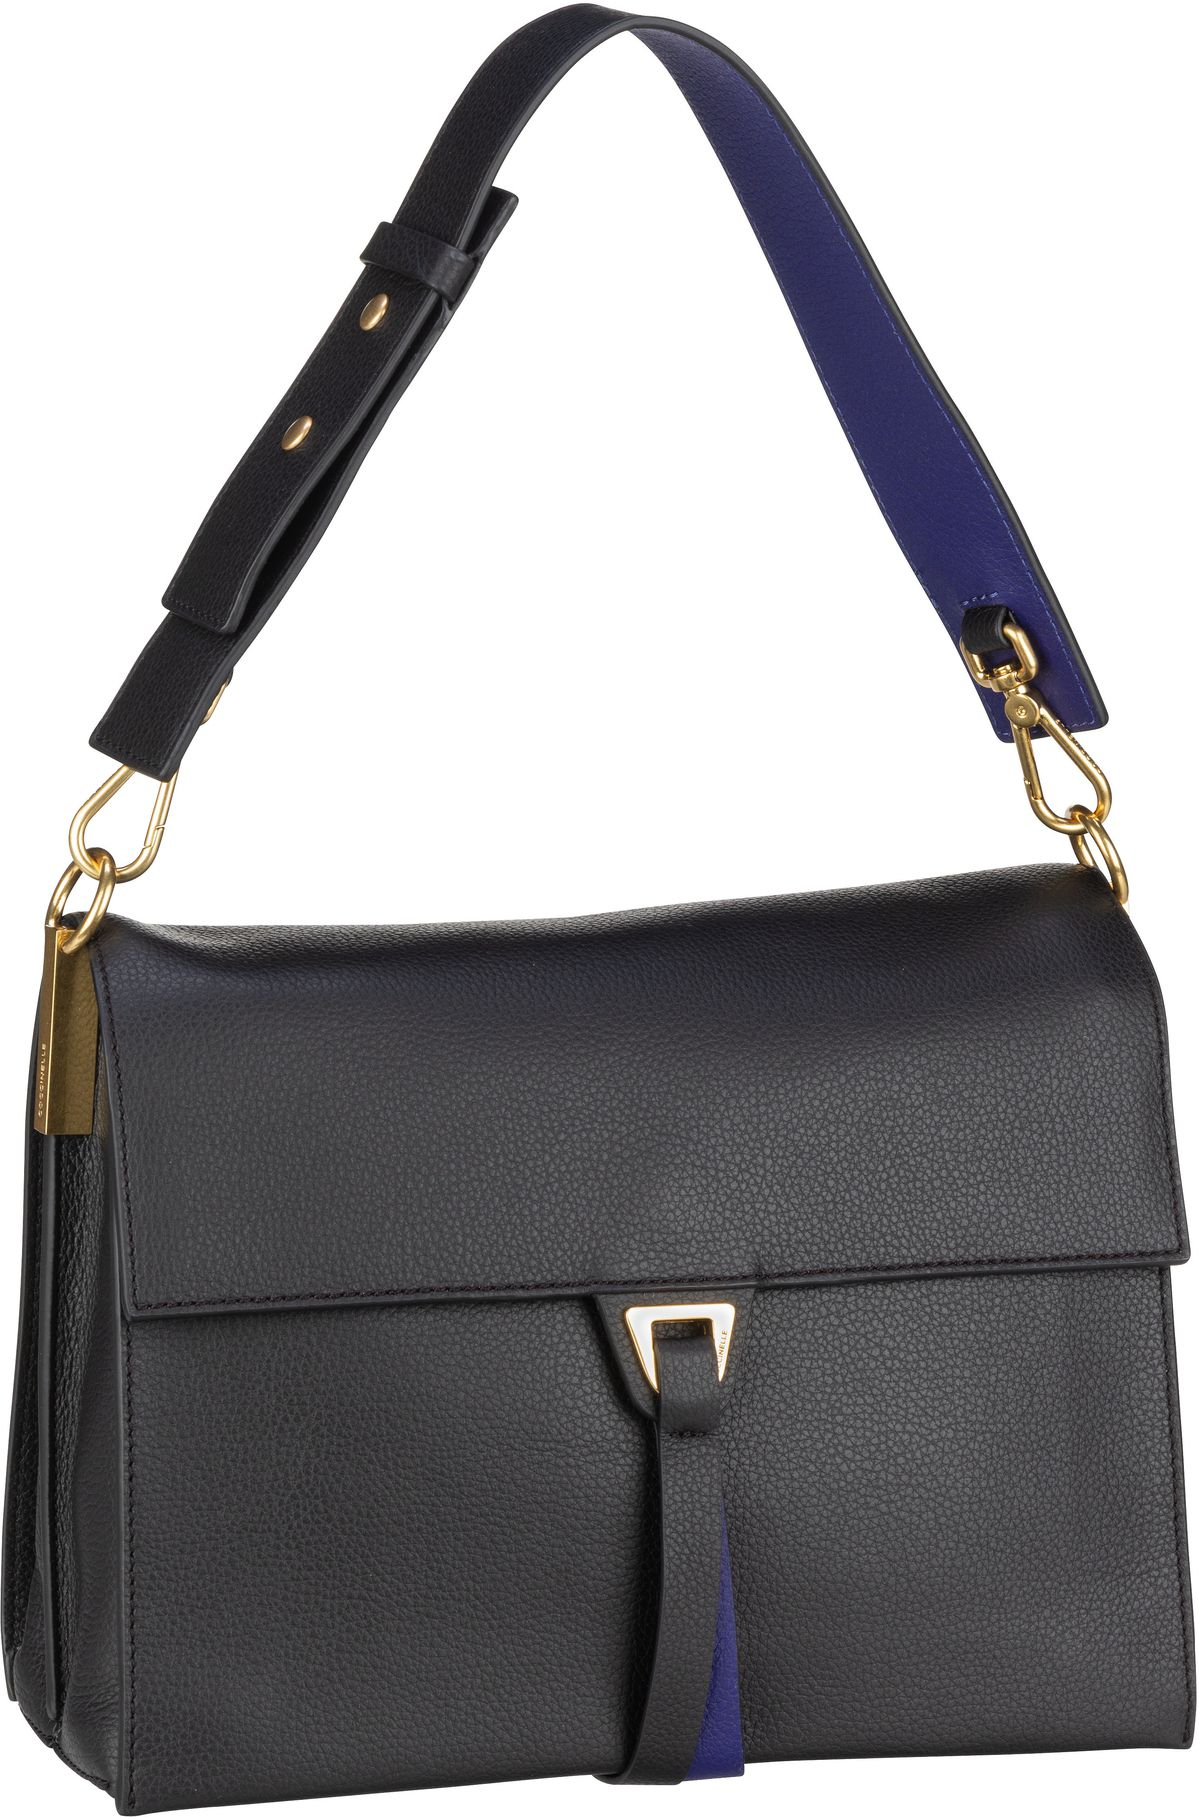 Handtasche Louise 1201 Nero/Curacao